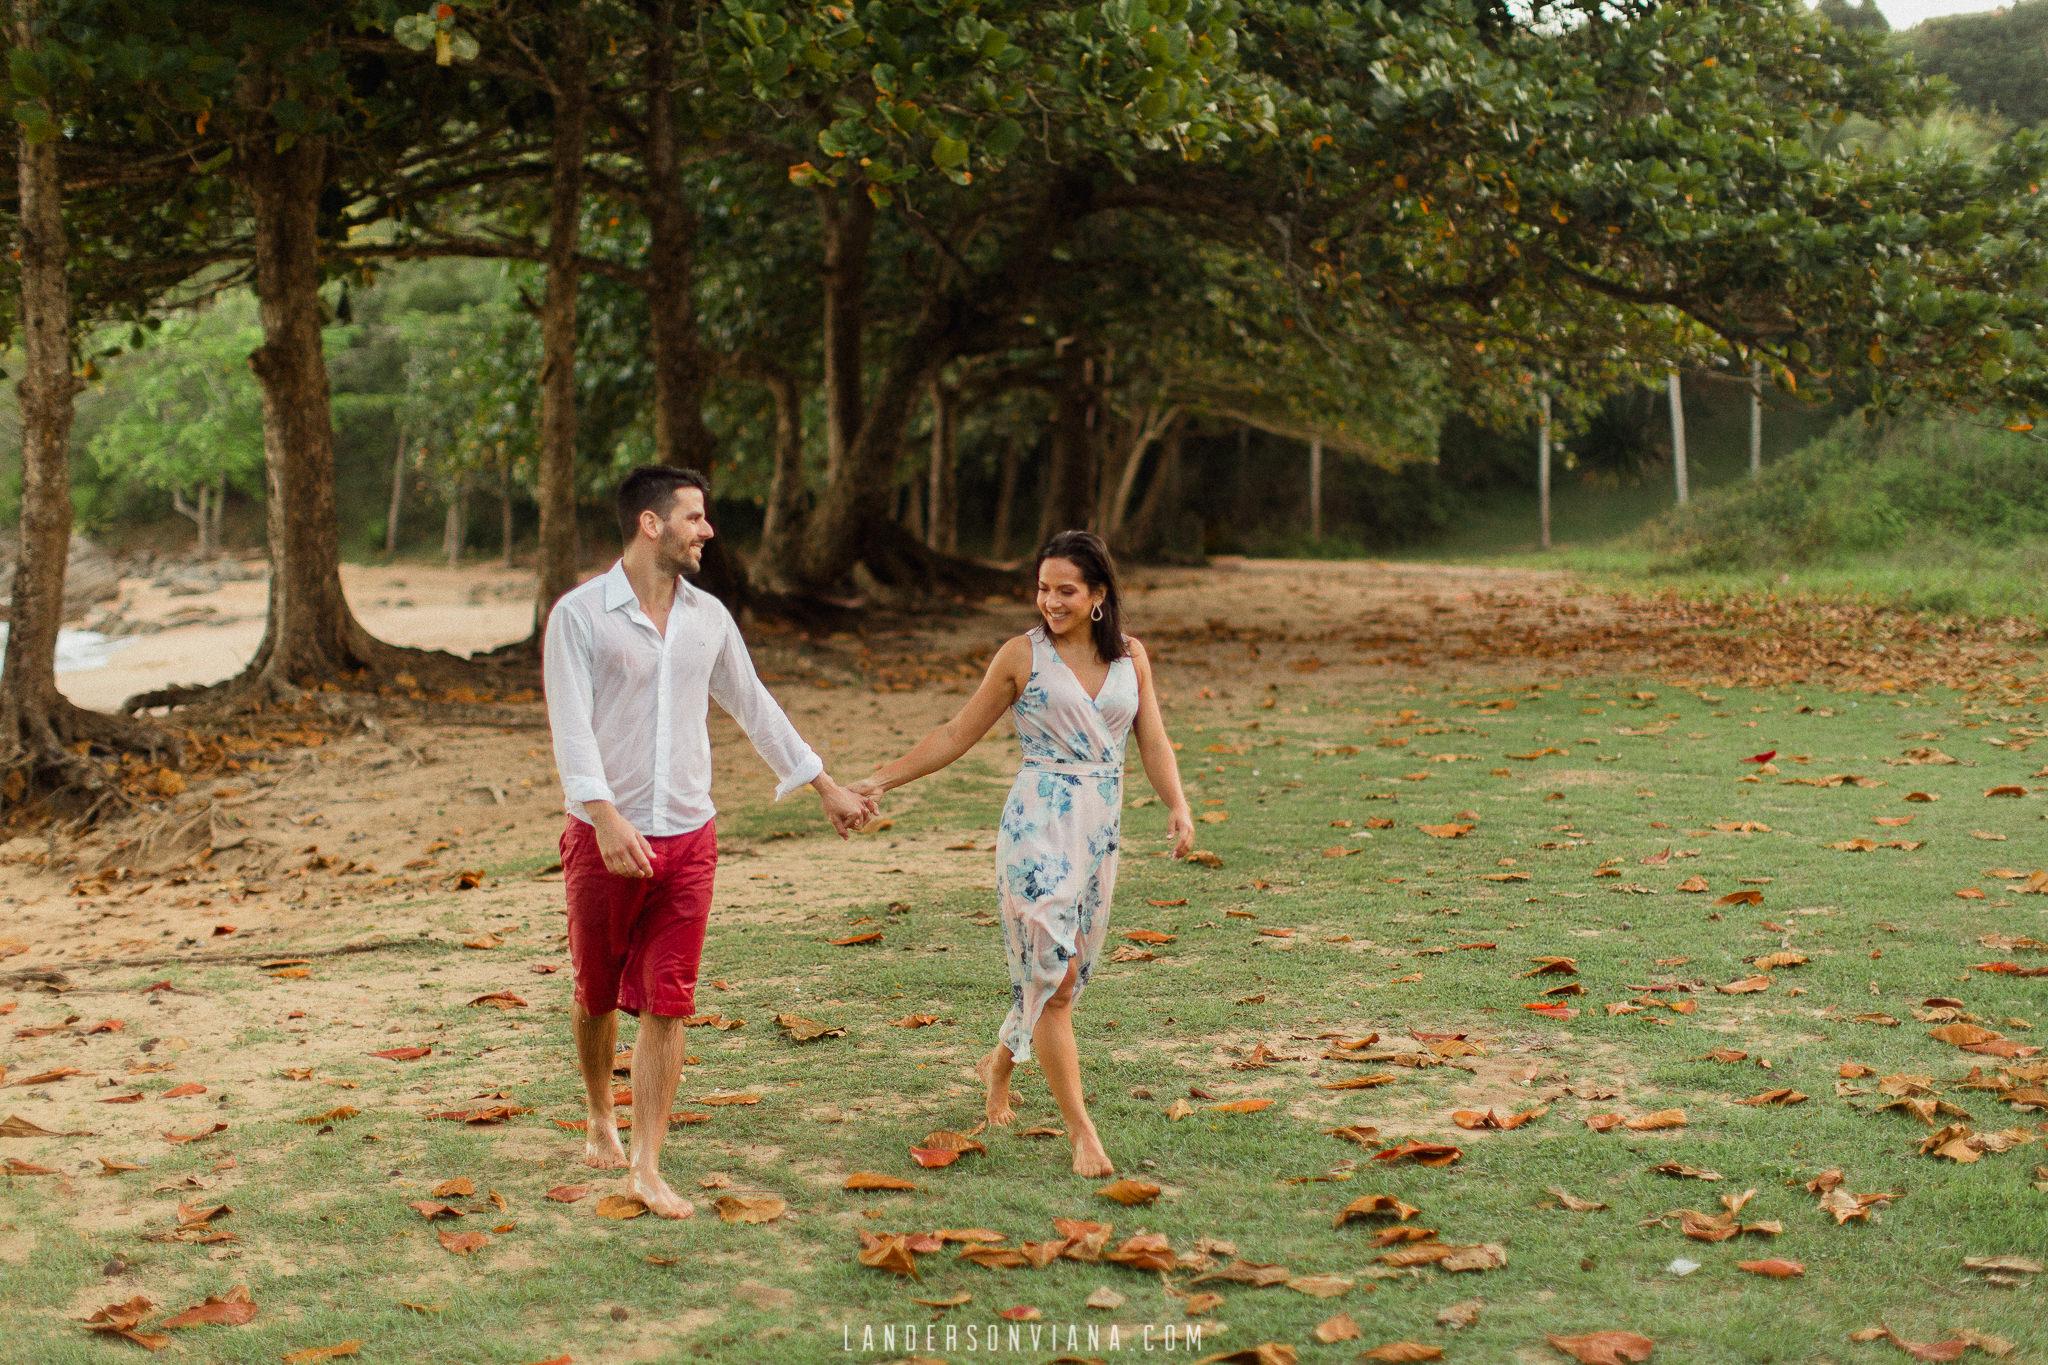 ensaio-pre-wedding-praia-landerson-viana-fotografia-casamento-pegueiobouquet-24.jpg